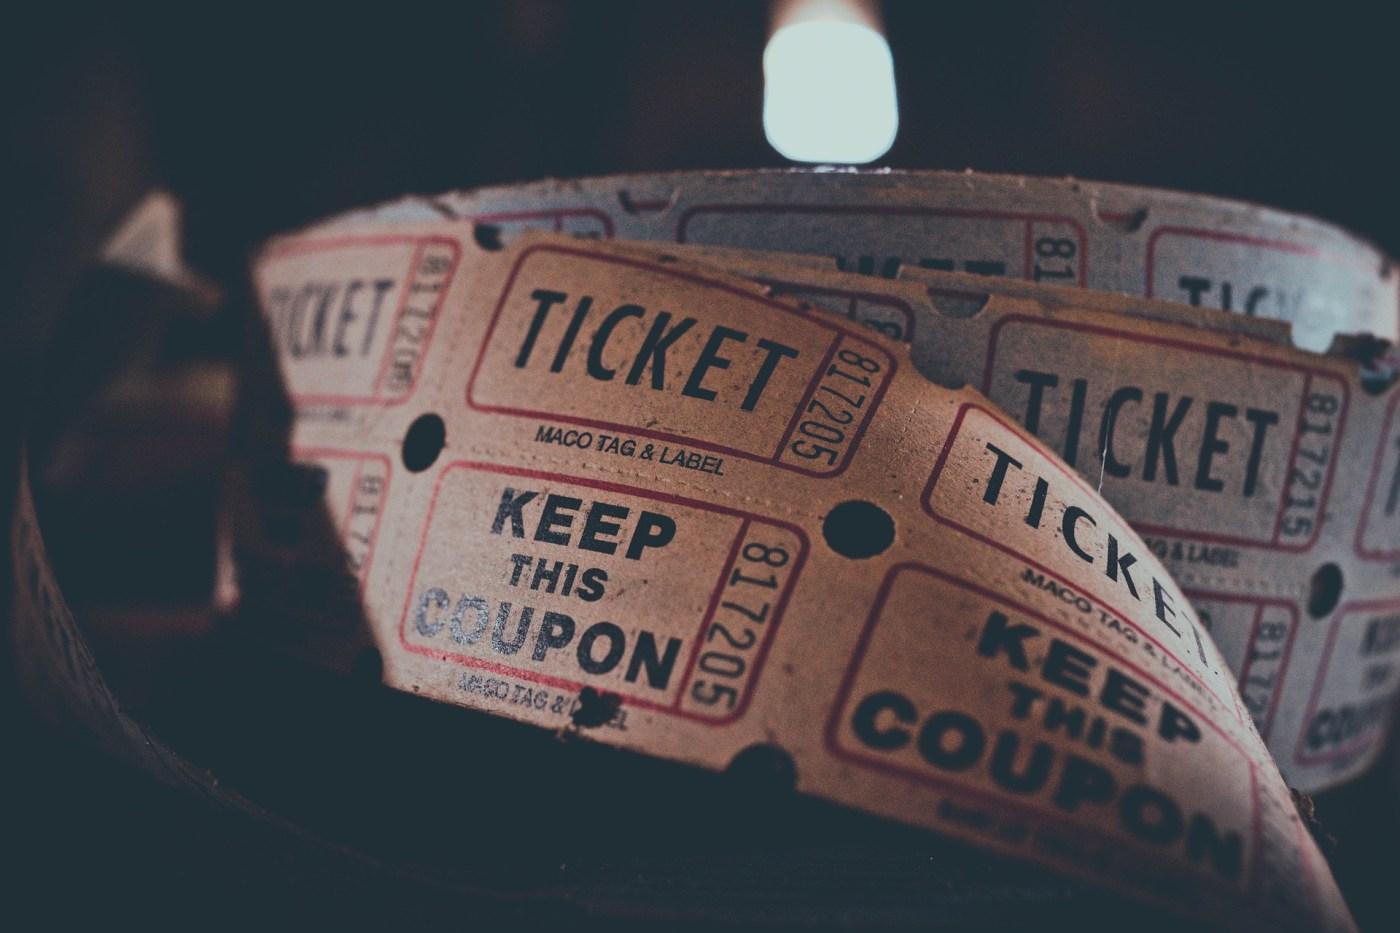 An old school reel of cinema style tickets.